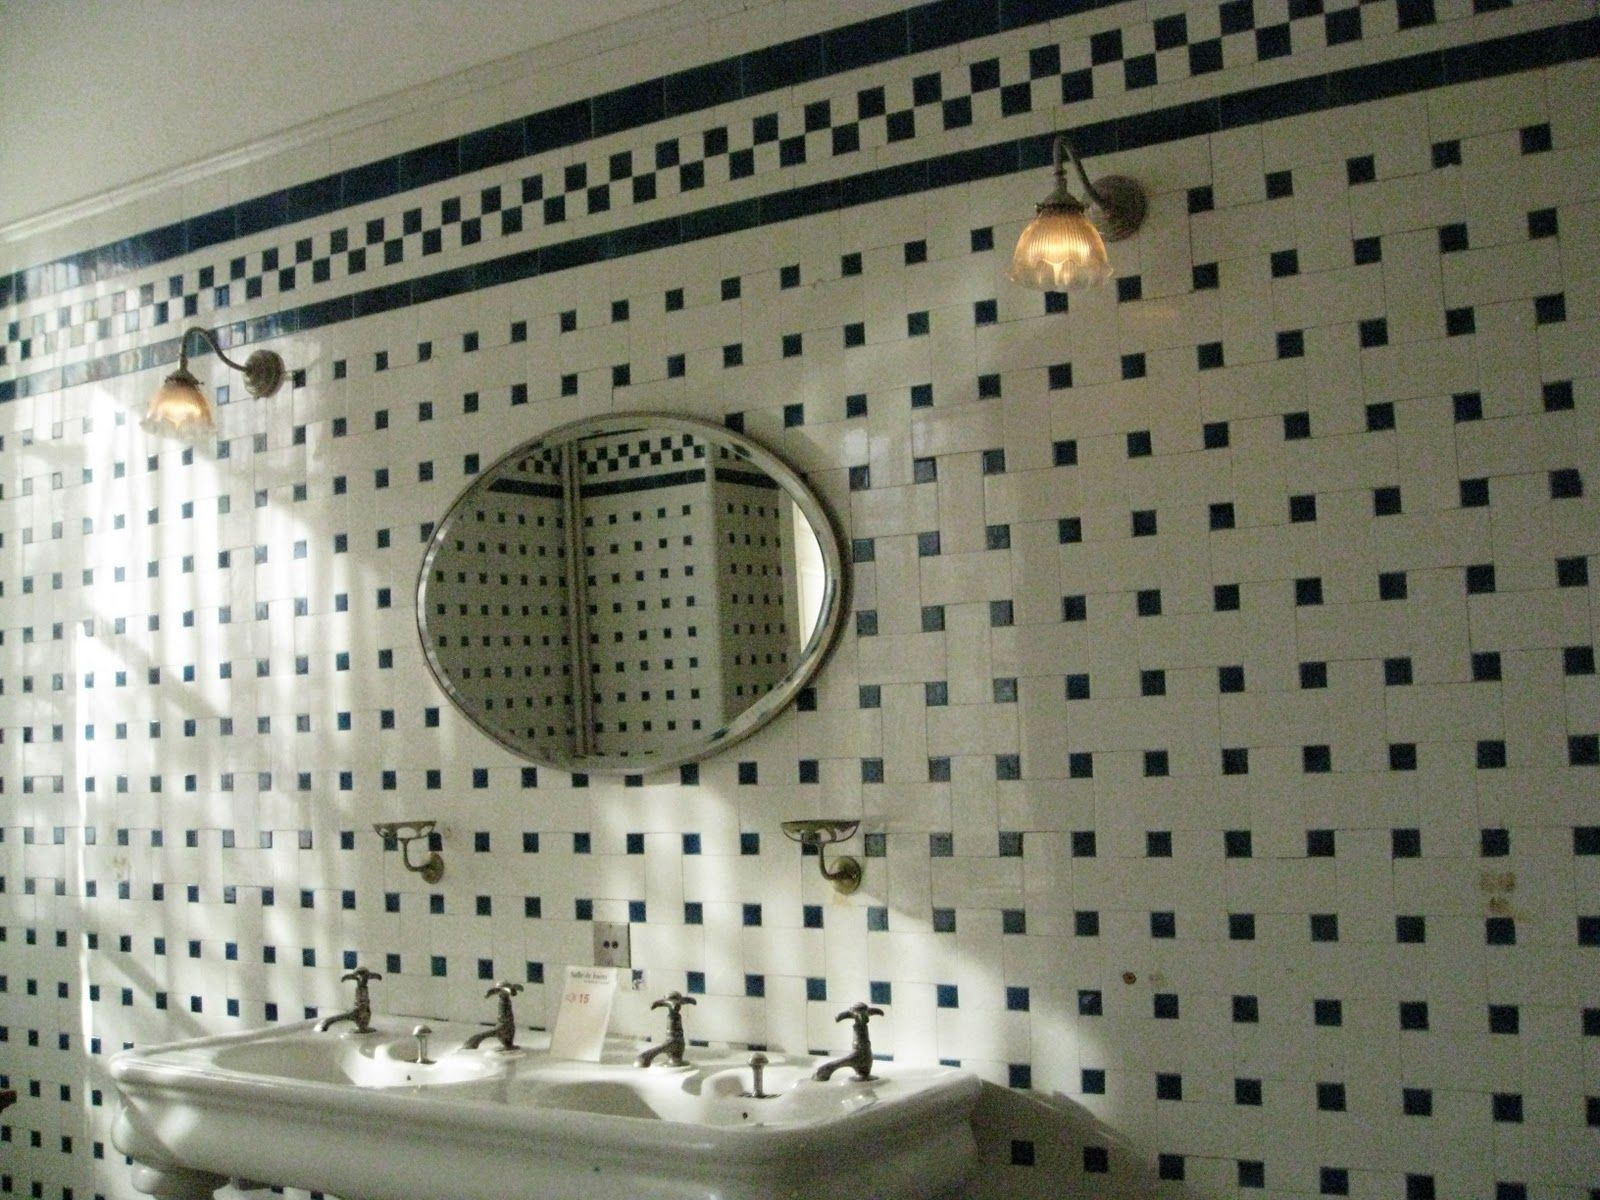 Salle de bains, Nissim de Camondo